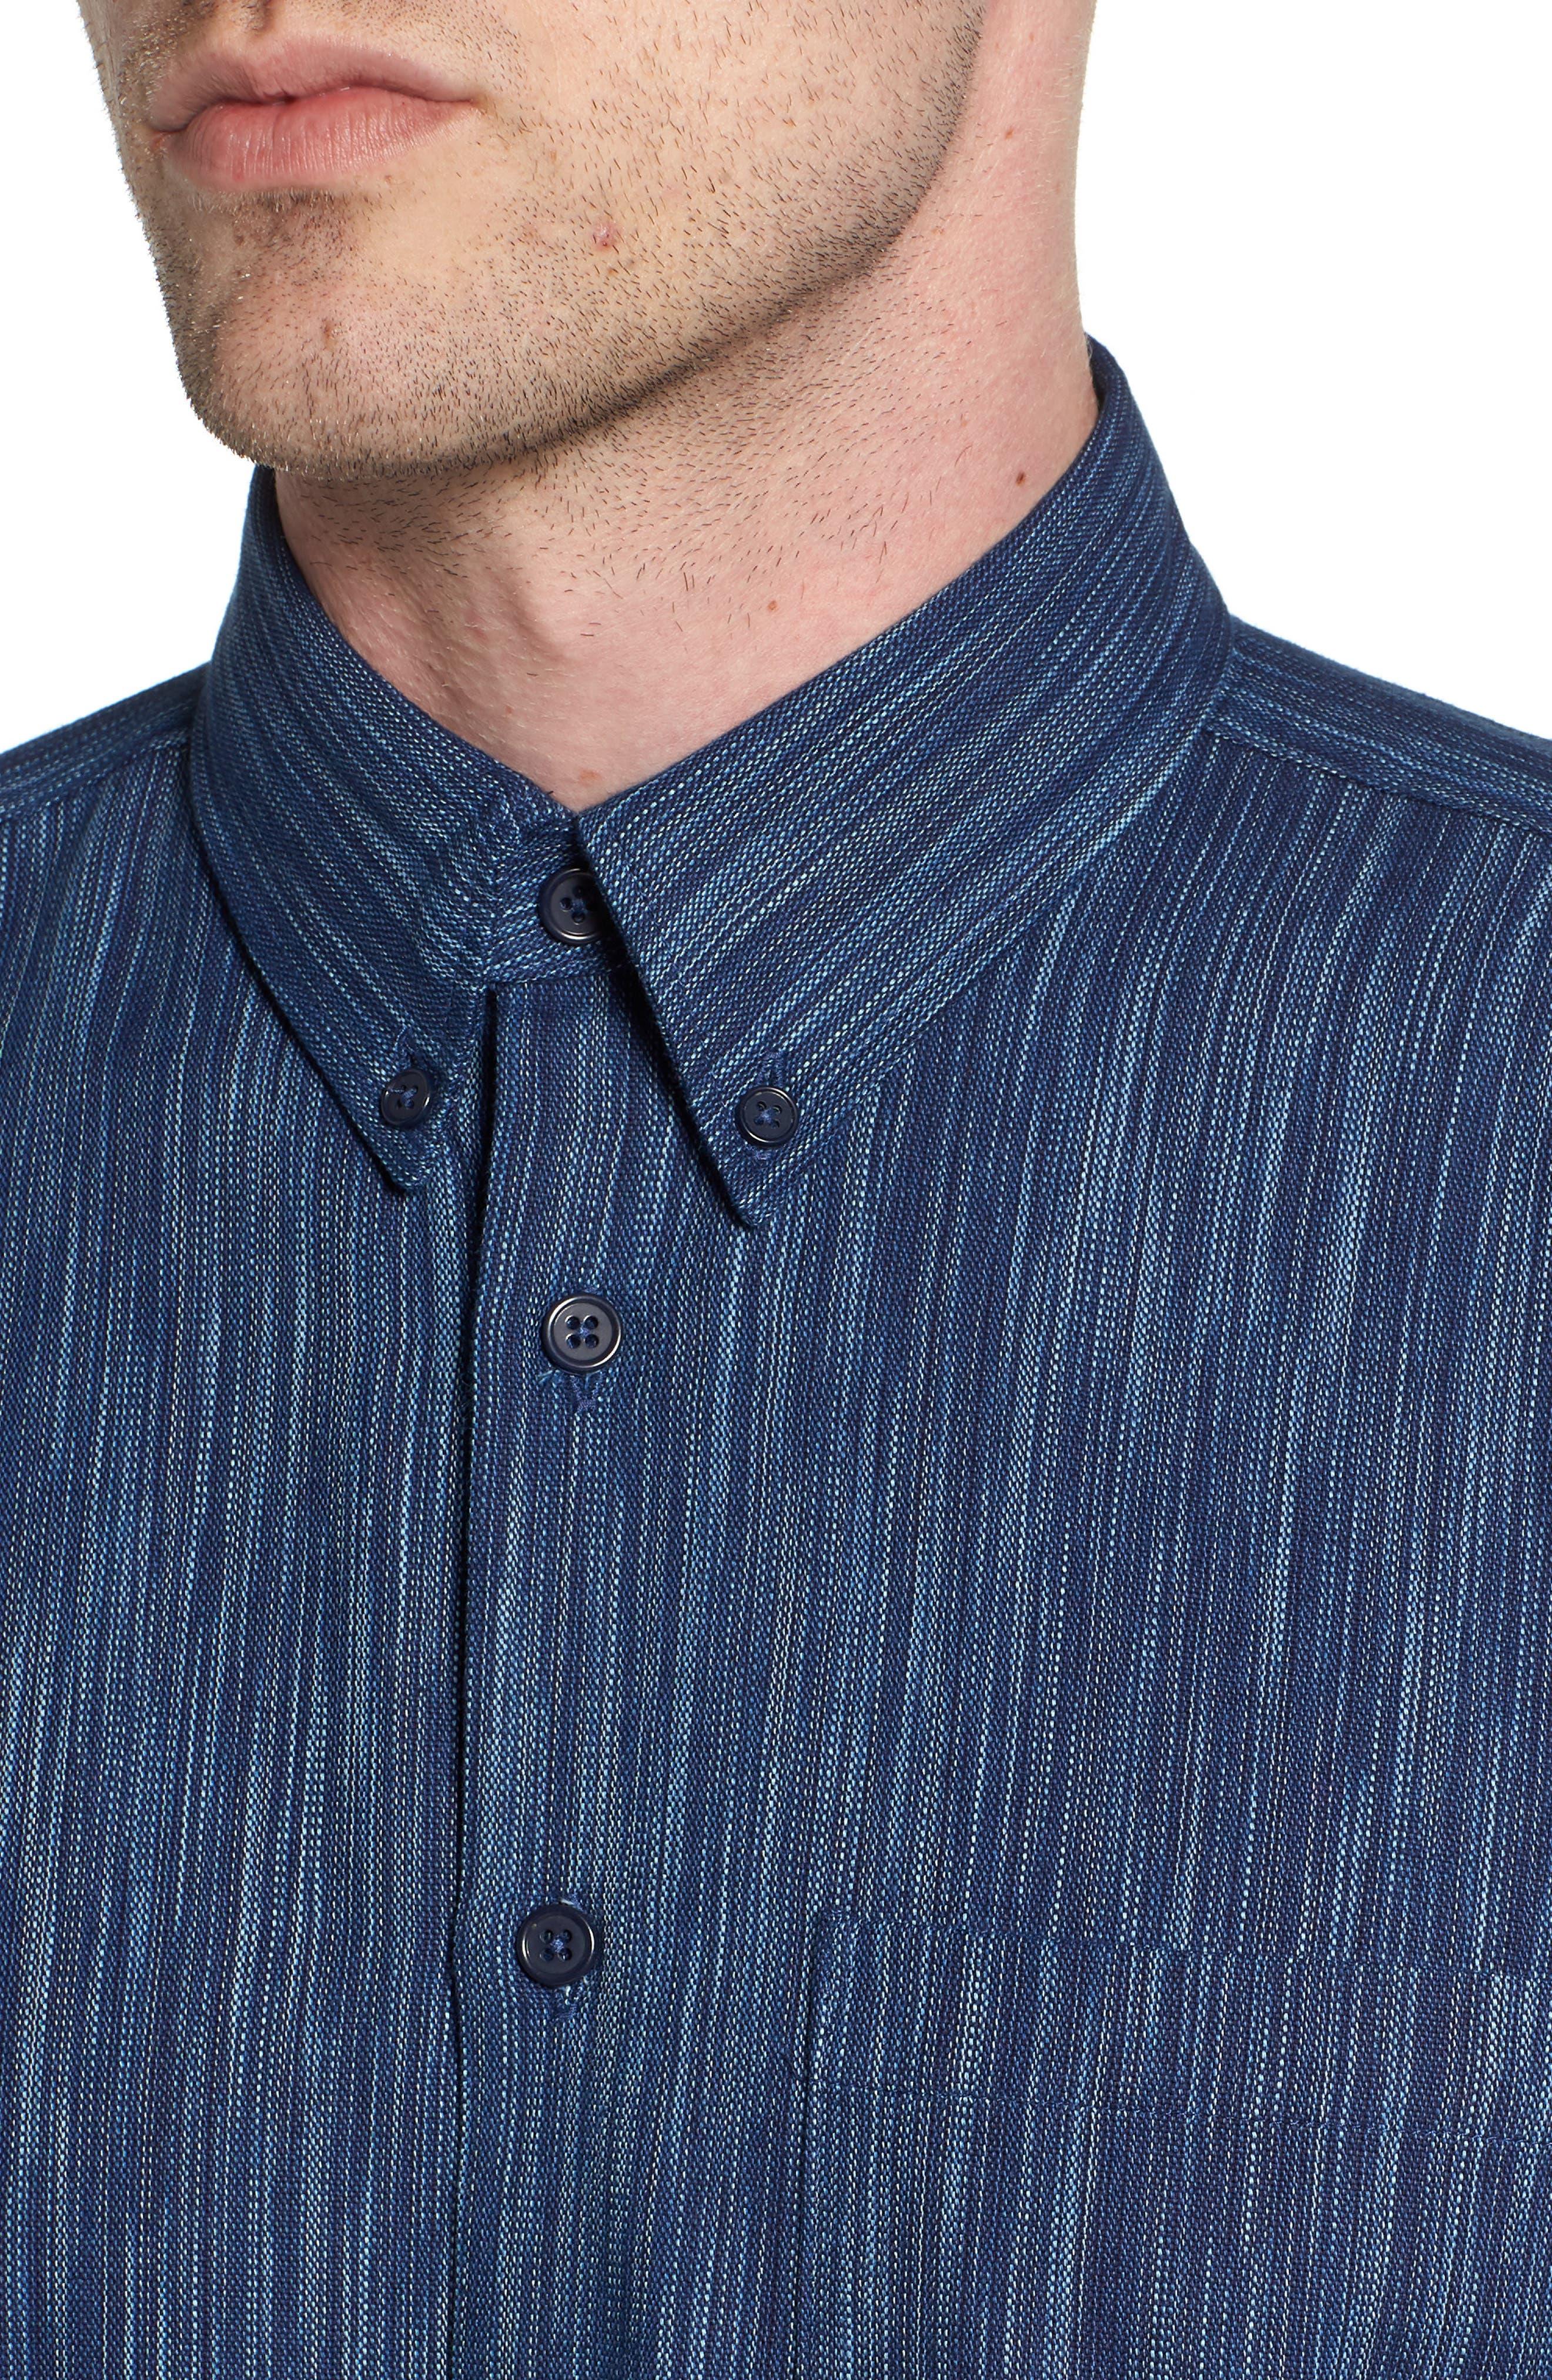 Indigo Tie Dye Rain Weave Shirt,                             Alternate thumbnail 4, color,                             Blue